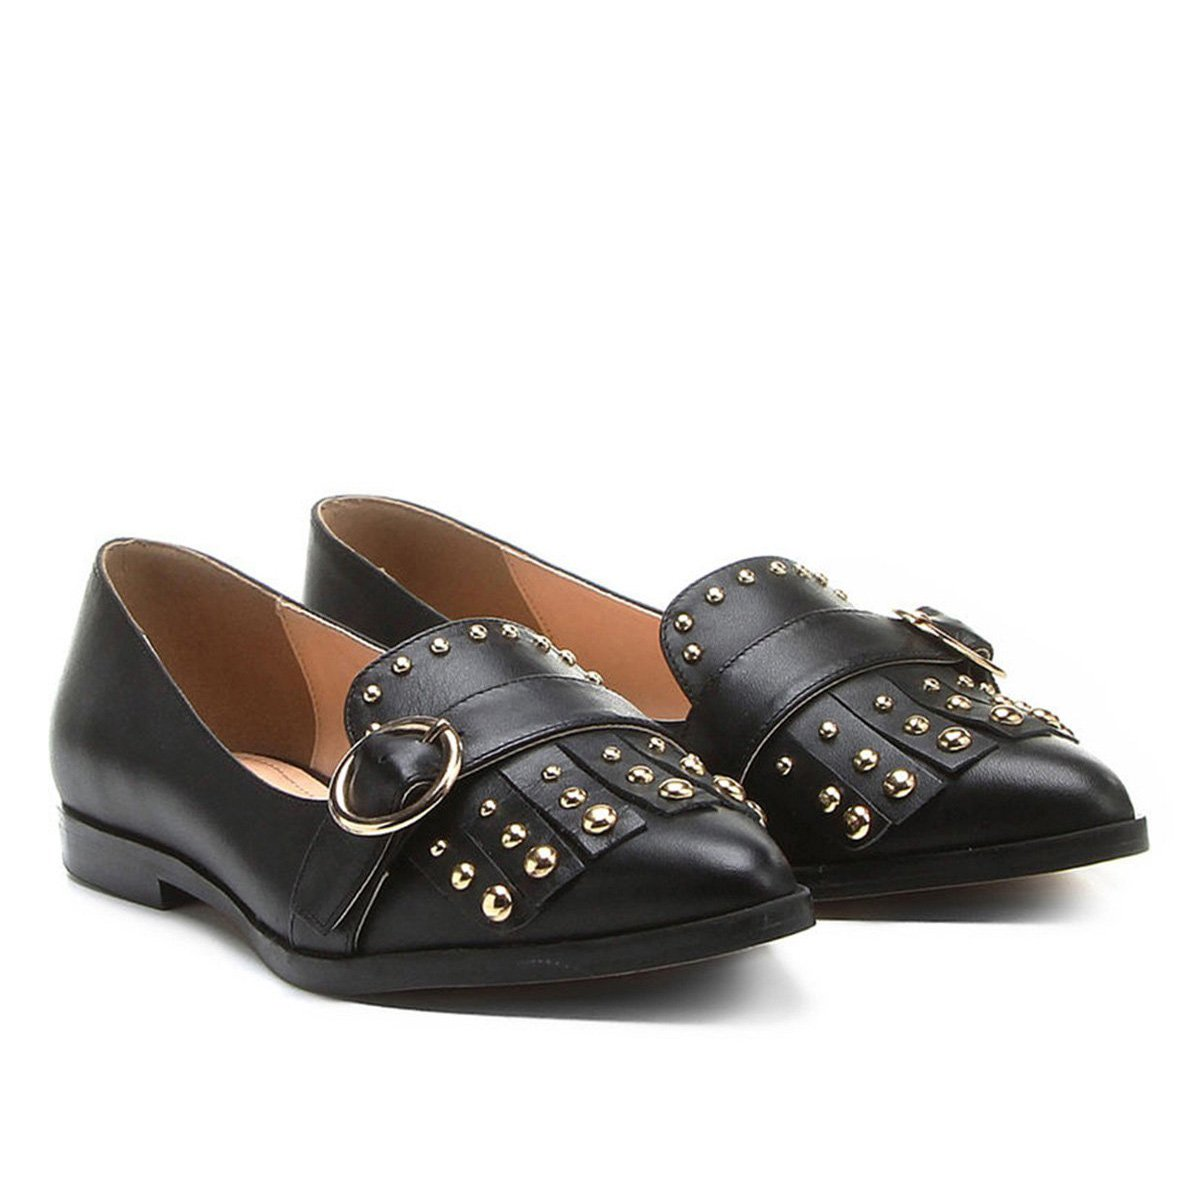 a6ffa1f499 Mocassim Couro Shoestock Bico Fino Mix Metais Feminino